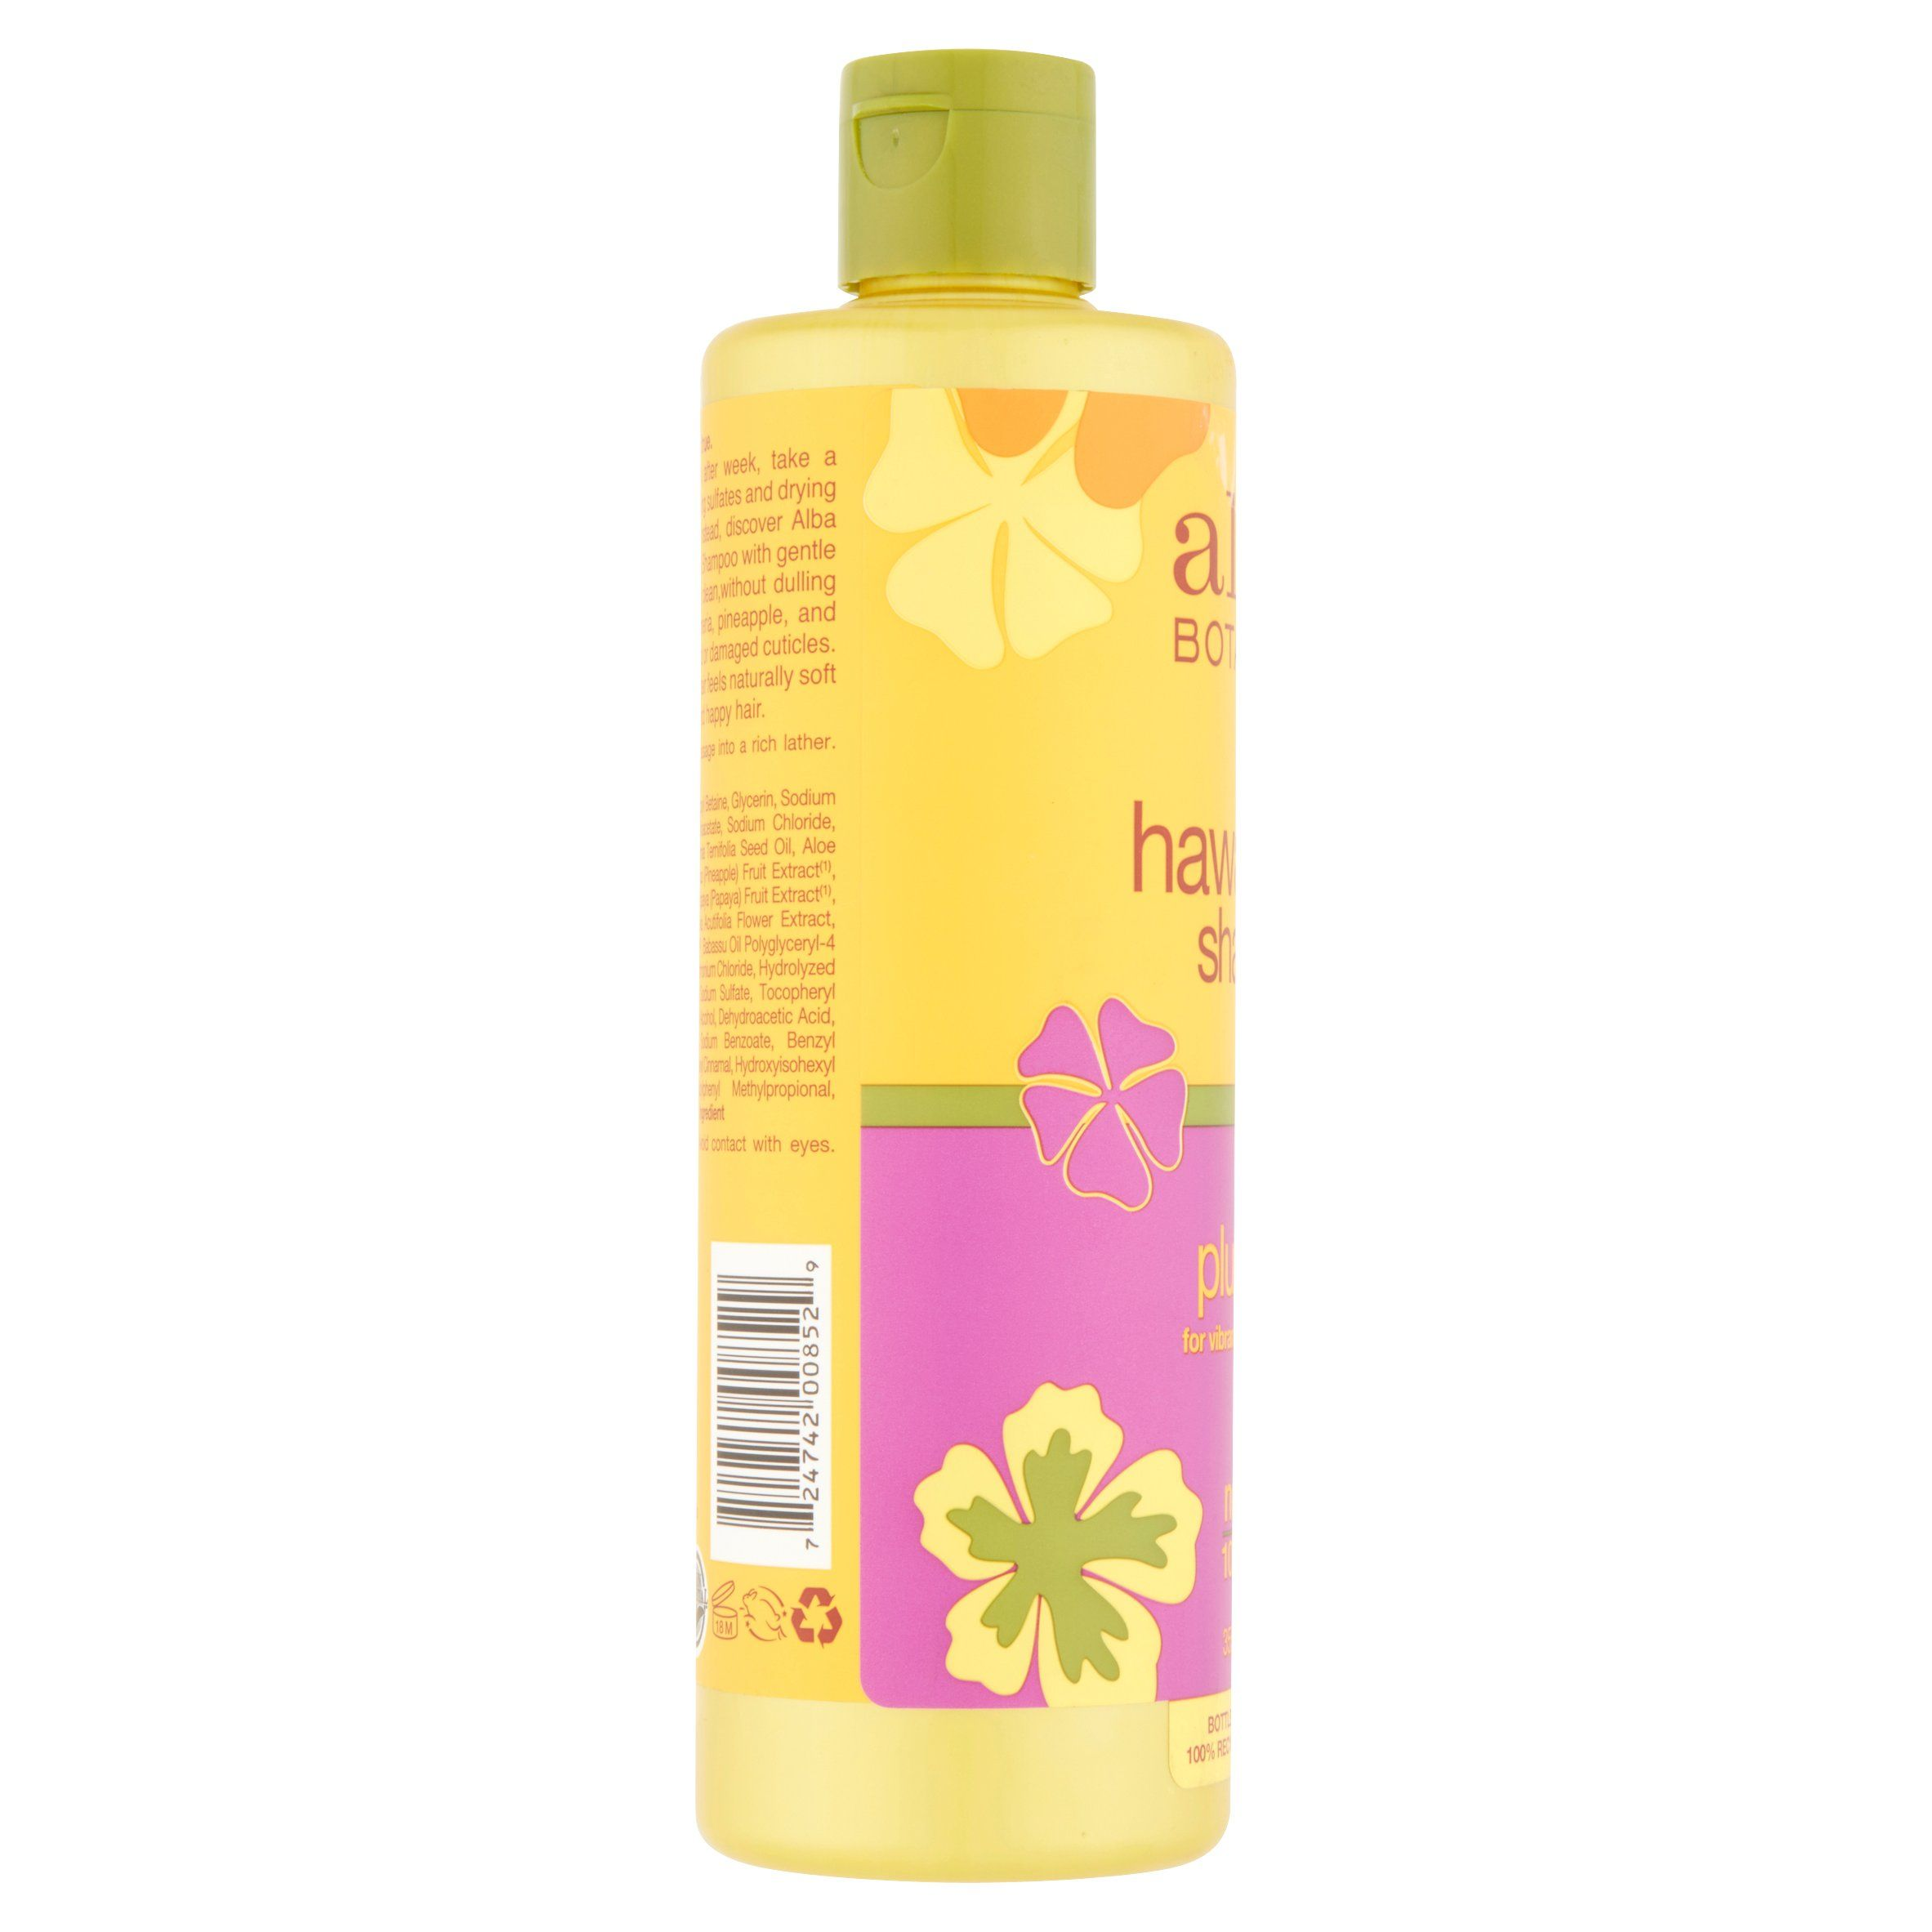 Alba Botanica Hawaiian Natural Shampoo Colorific Plumeria 12 Fl Oz Walmart Com In 2020 Shampoo Natural Shampoo Nourishing Shampoo